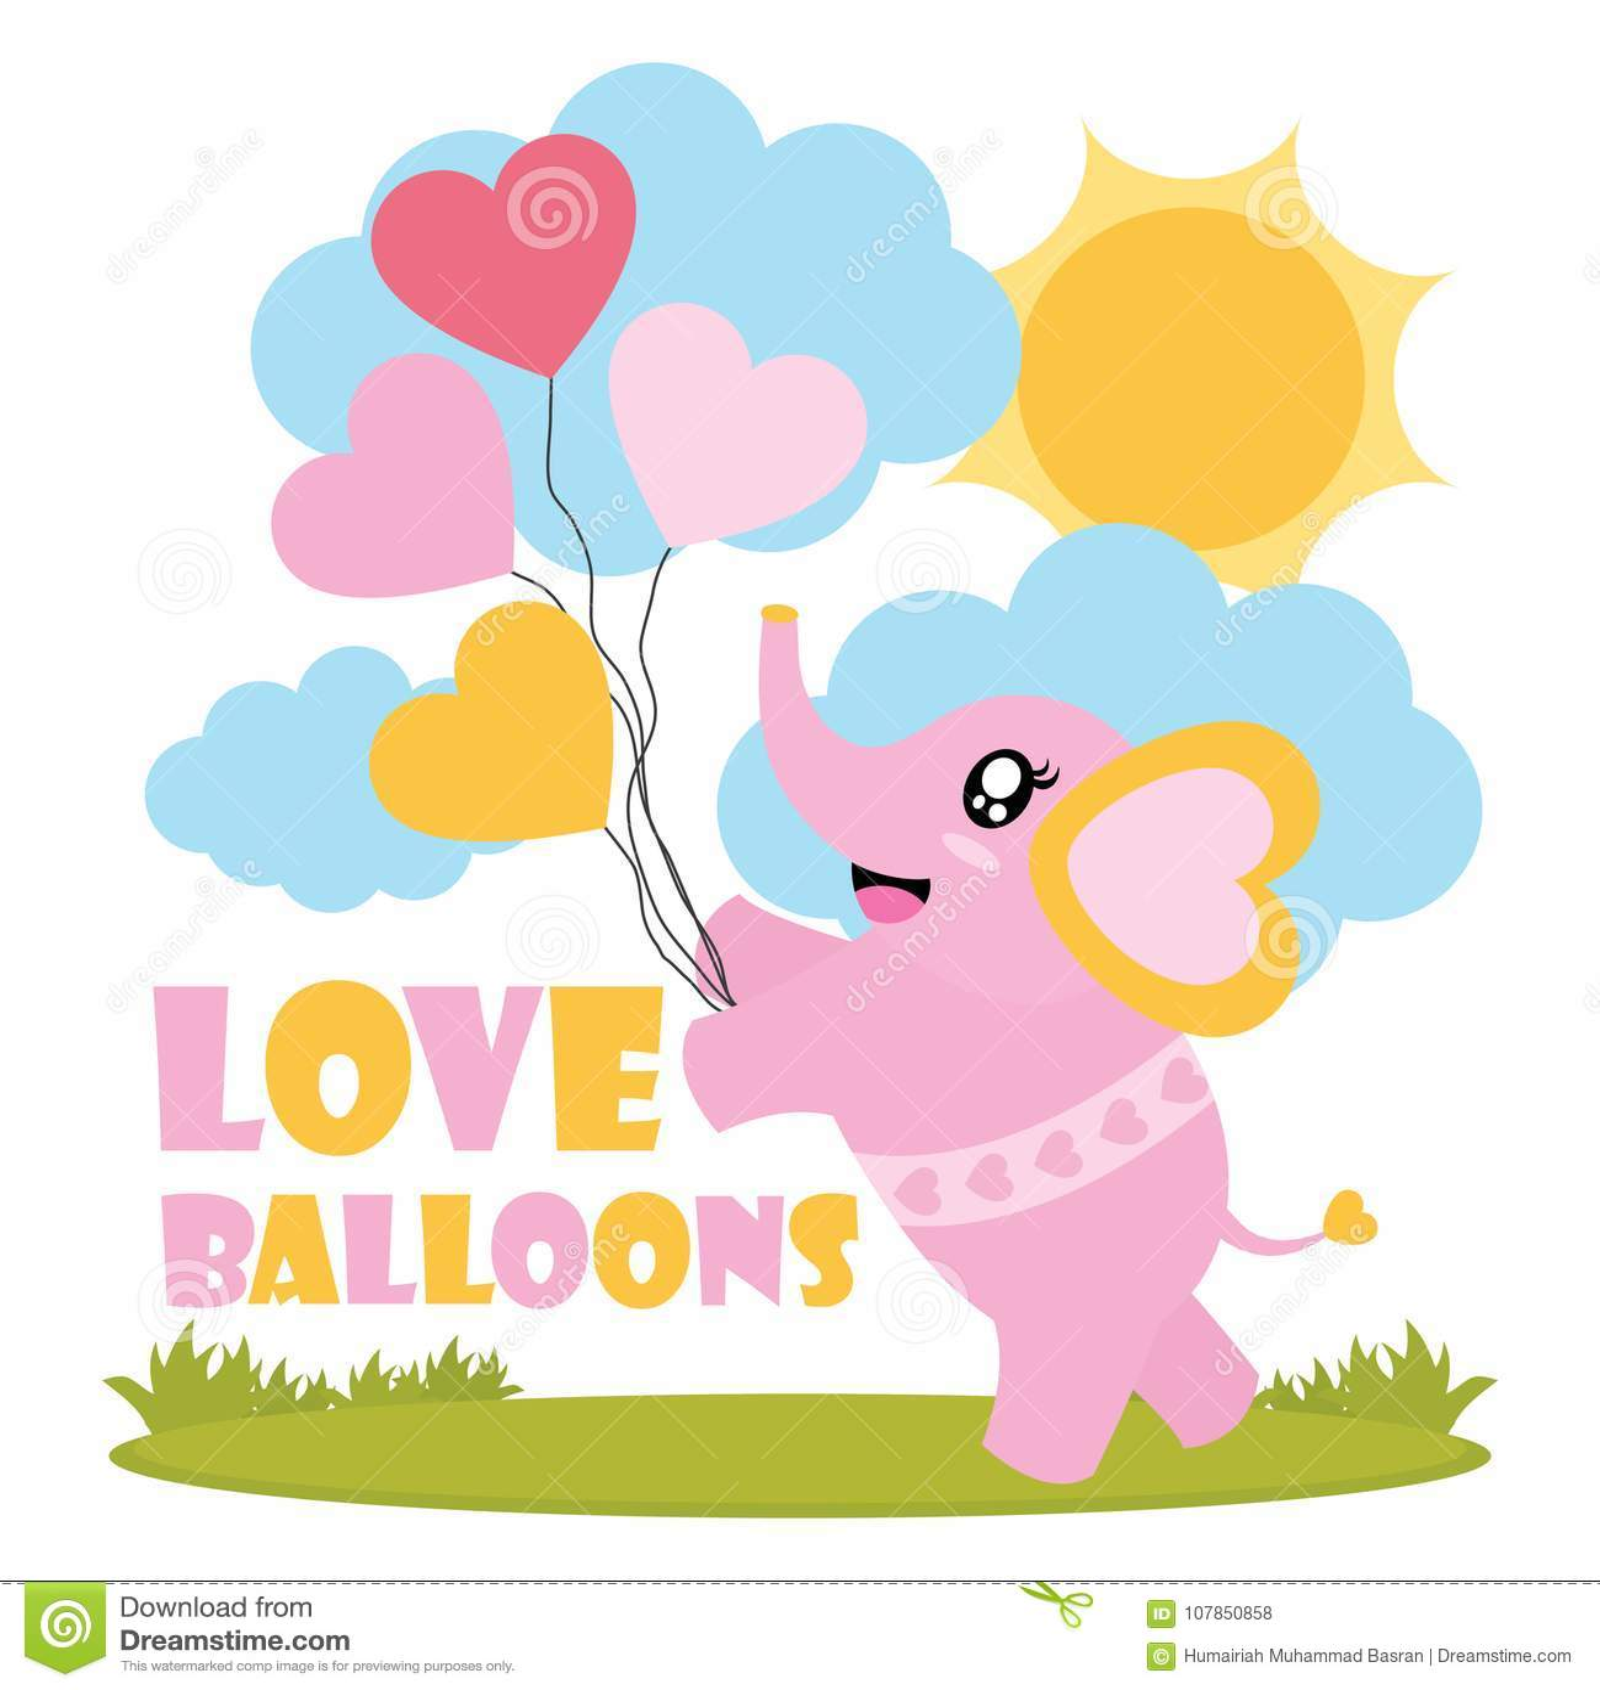 Cute Baby Elephant Brings Love Balloons Cartoon Illustration For